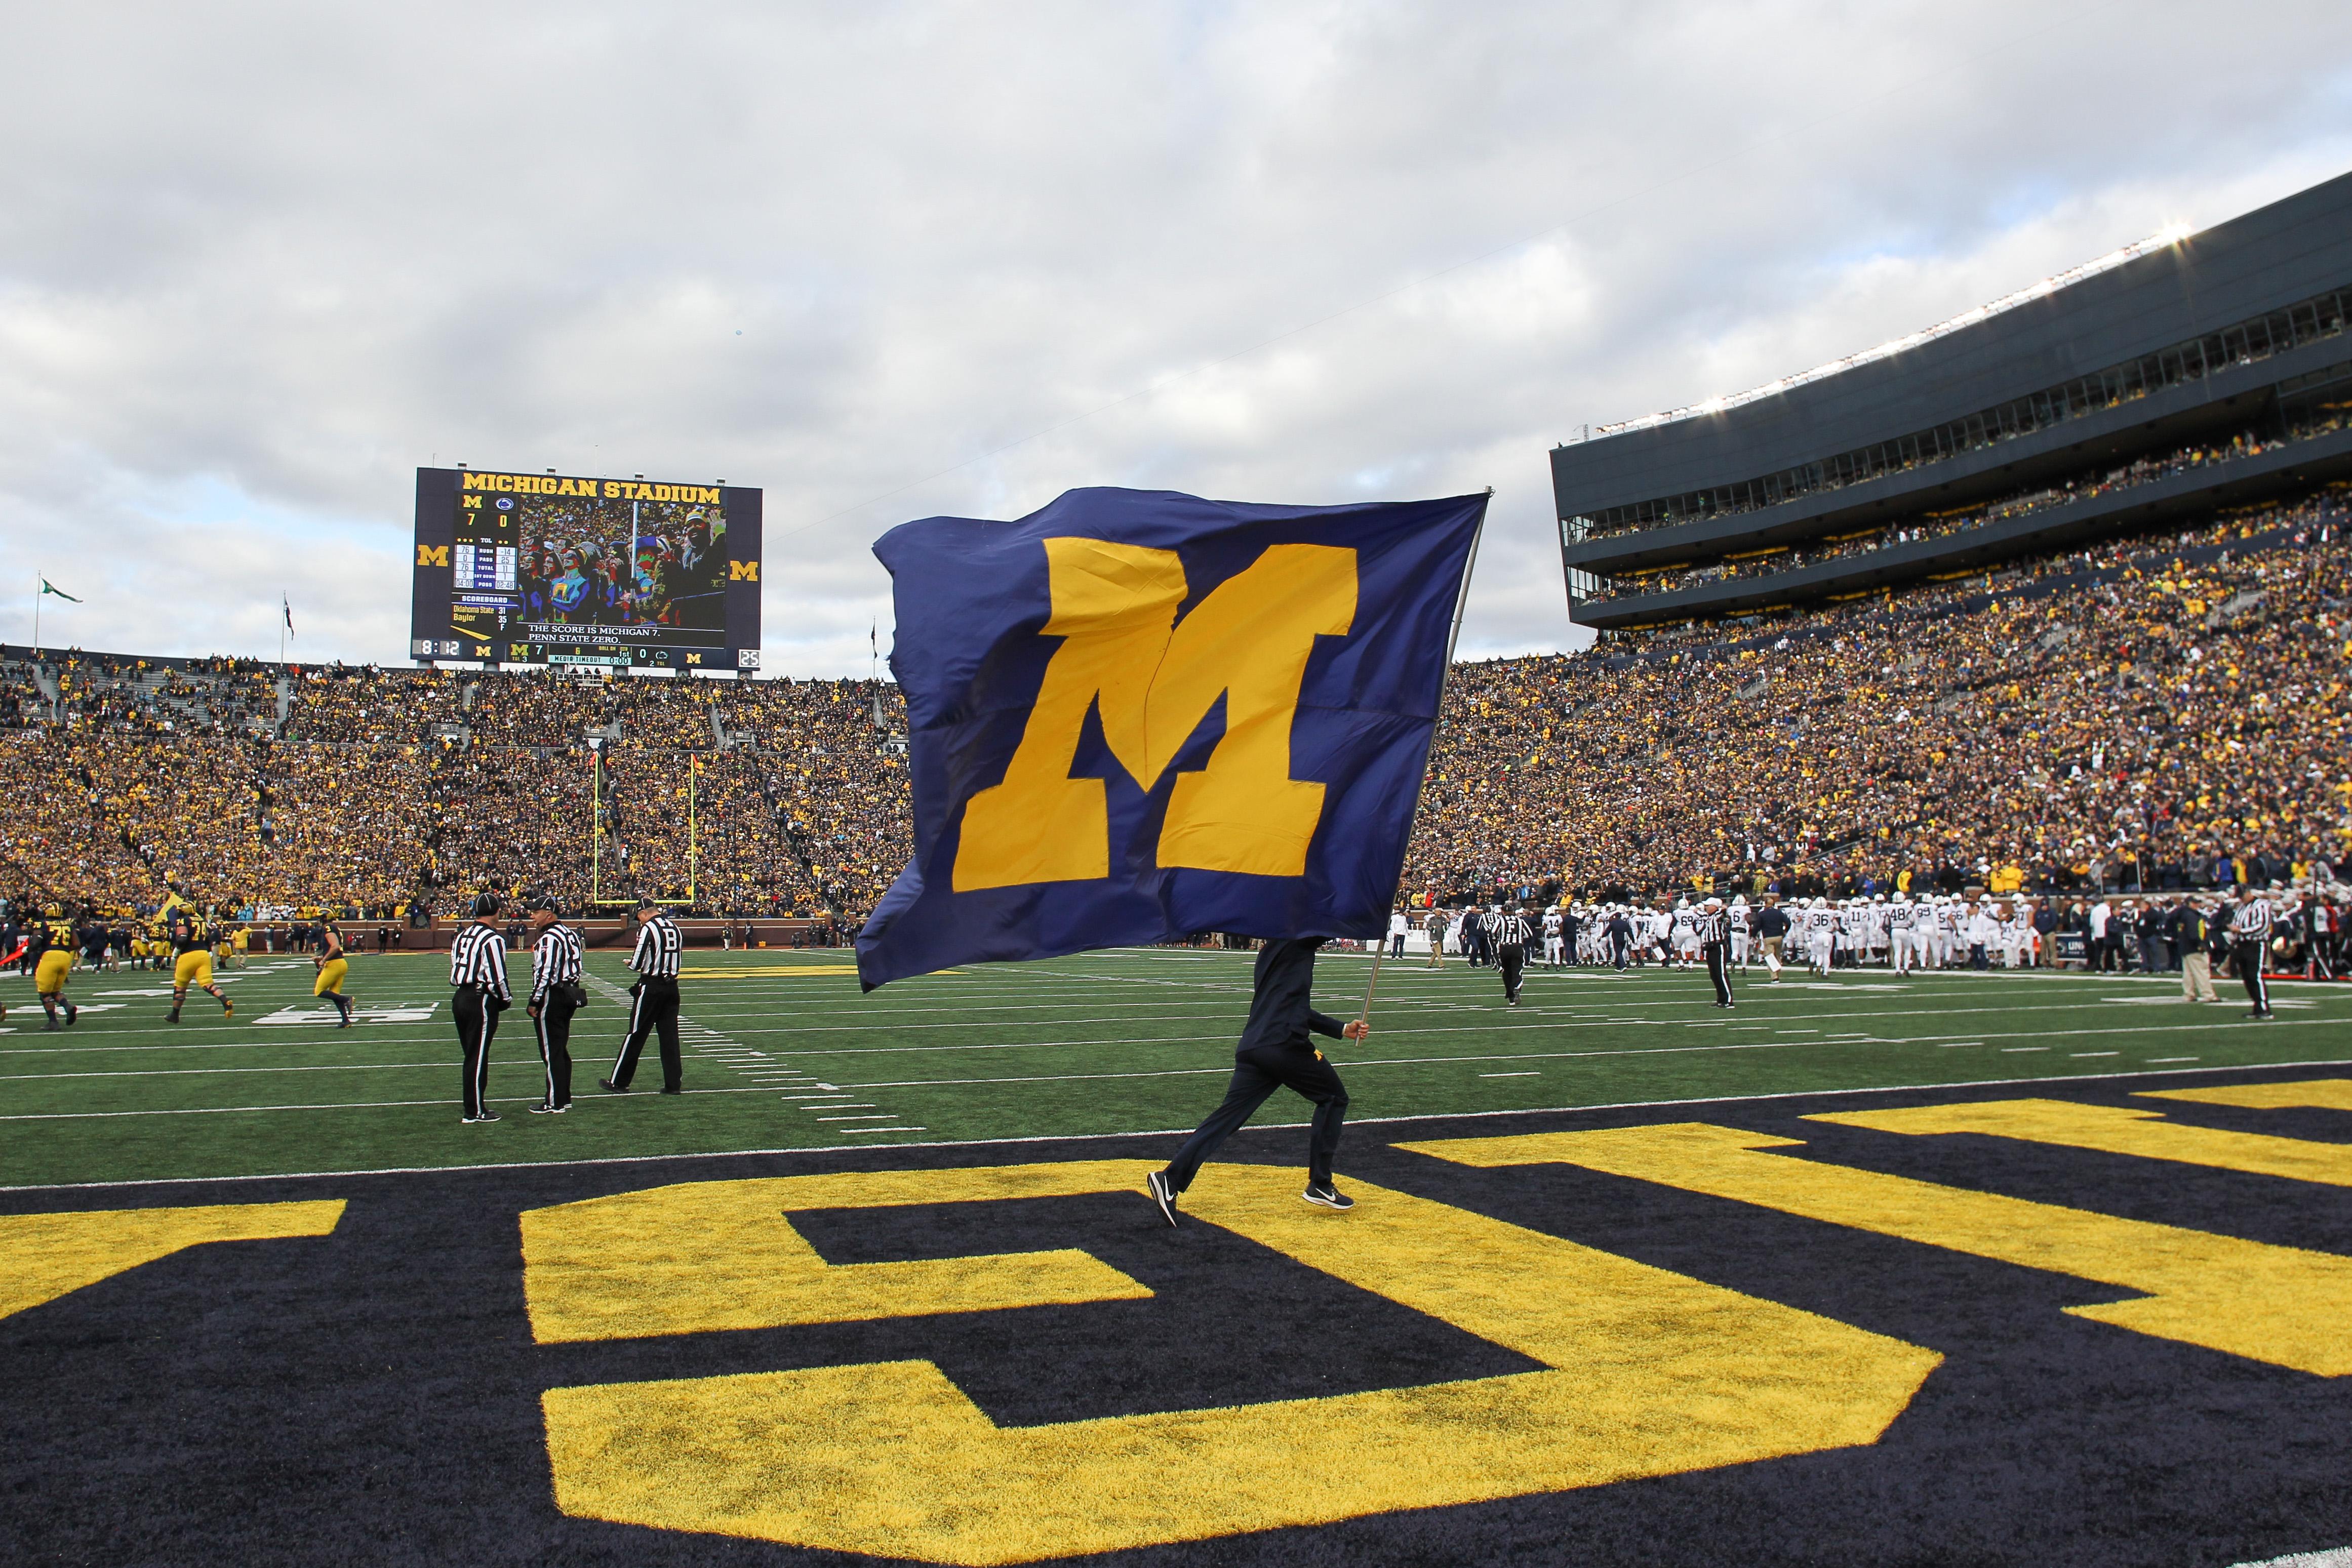 COLLEGE FOOTBALL: NOV 03 Penn State at Michigan